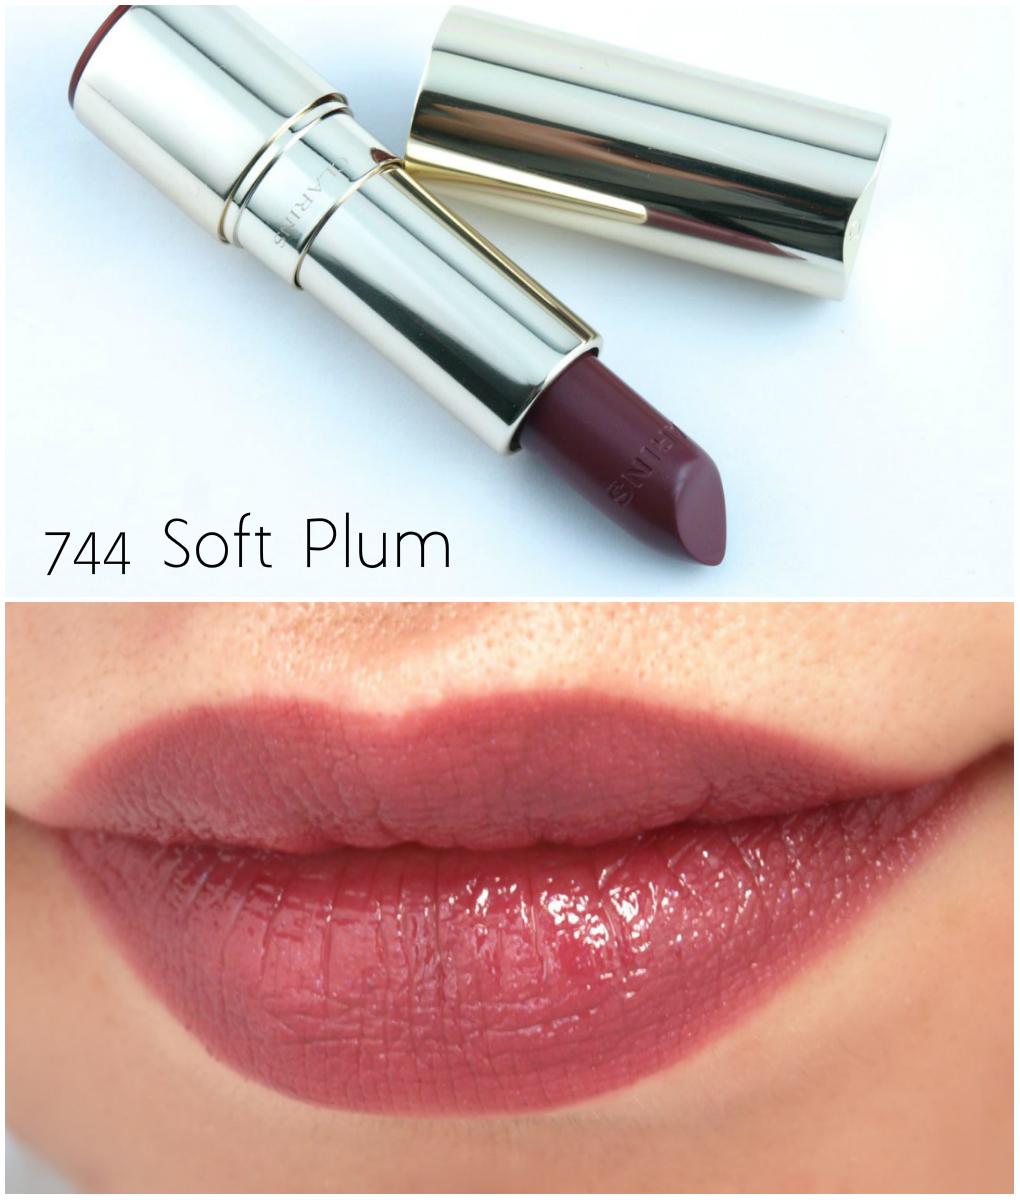 Clarins Lipstick Colors